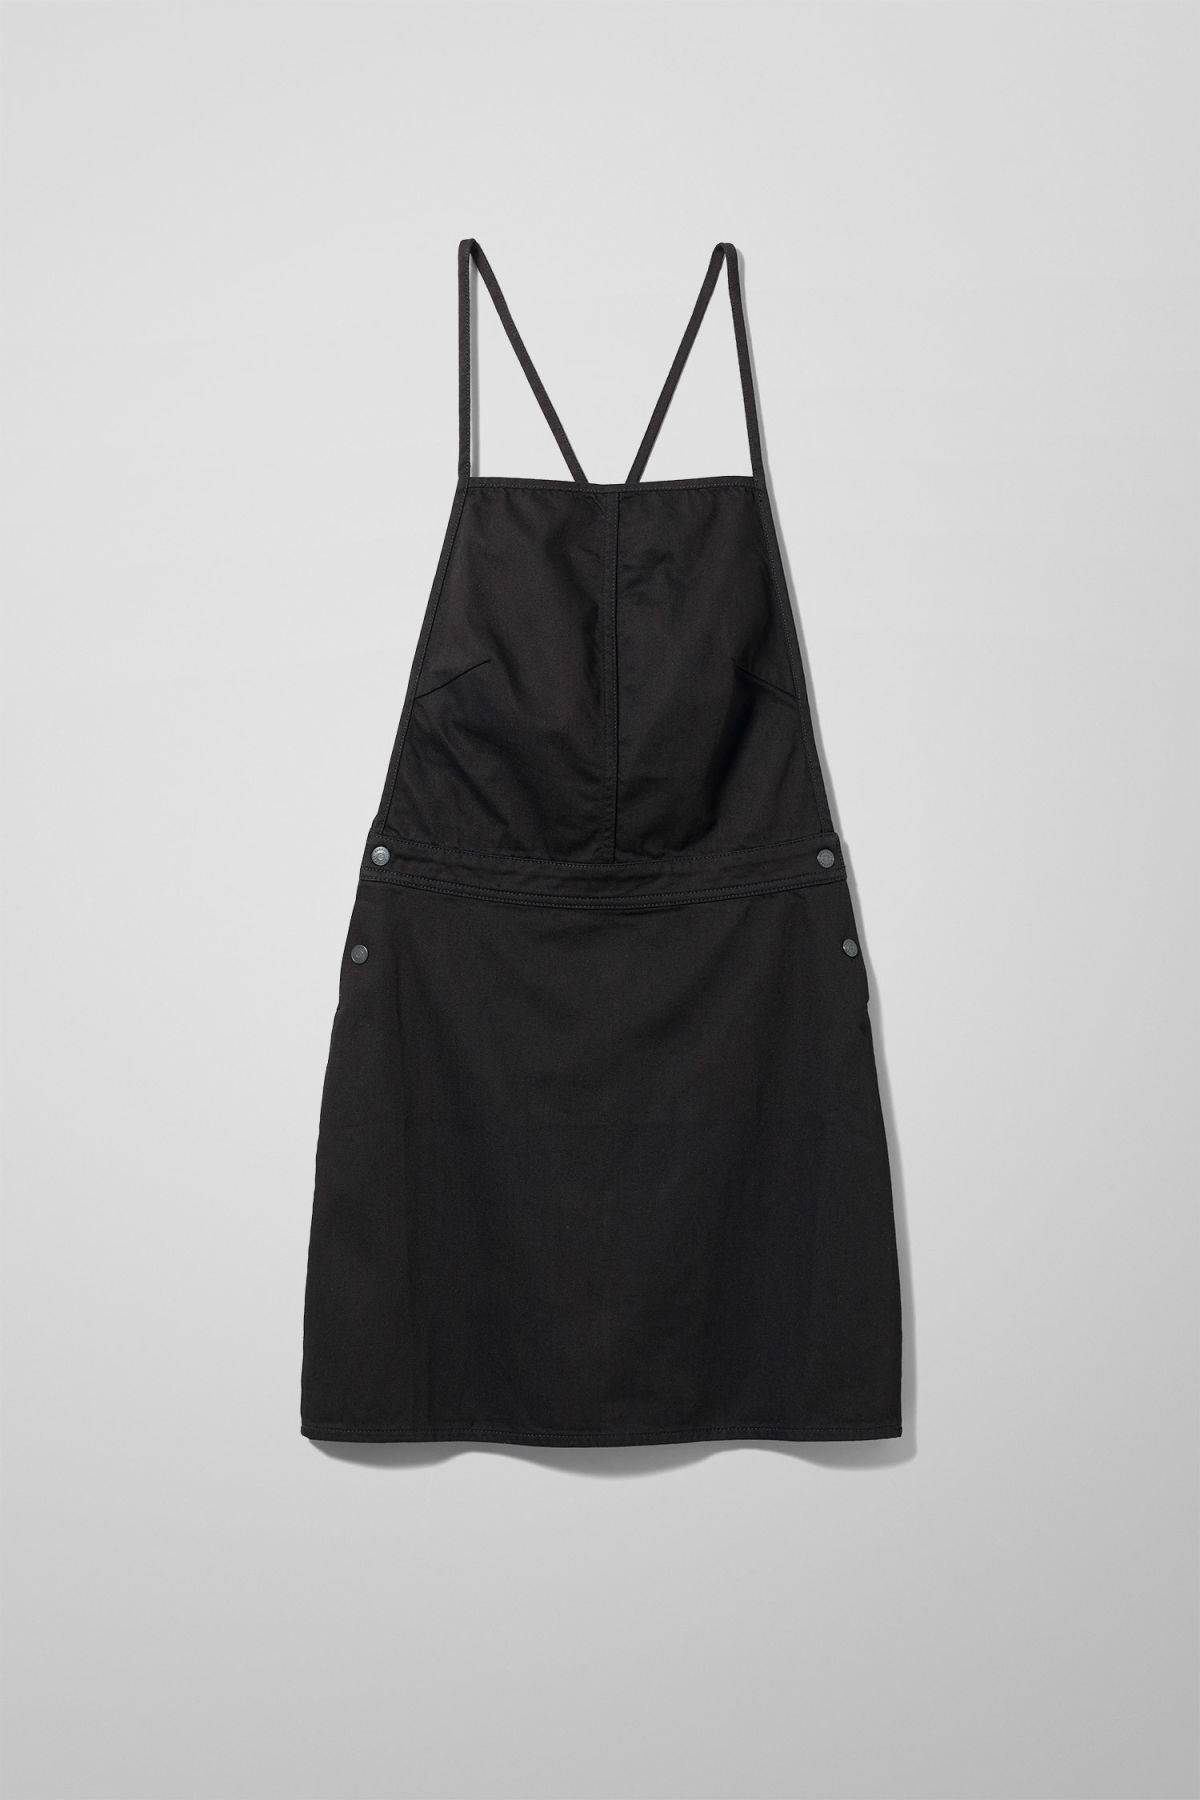 Image of Irene Denim Dress Washed Black - Black-34